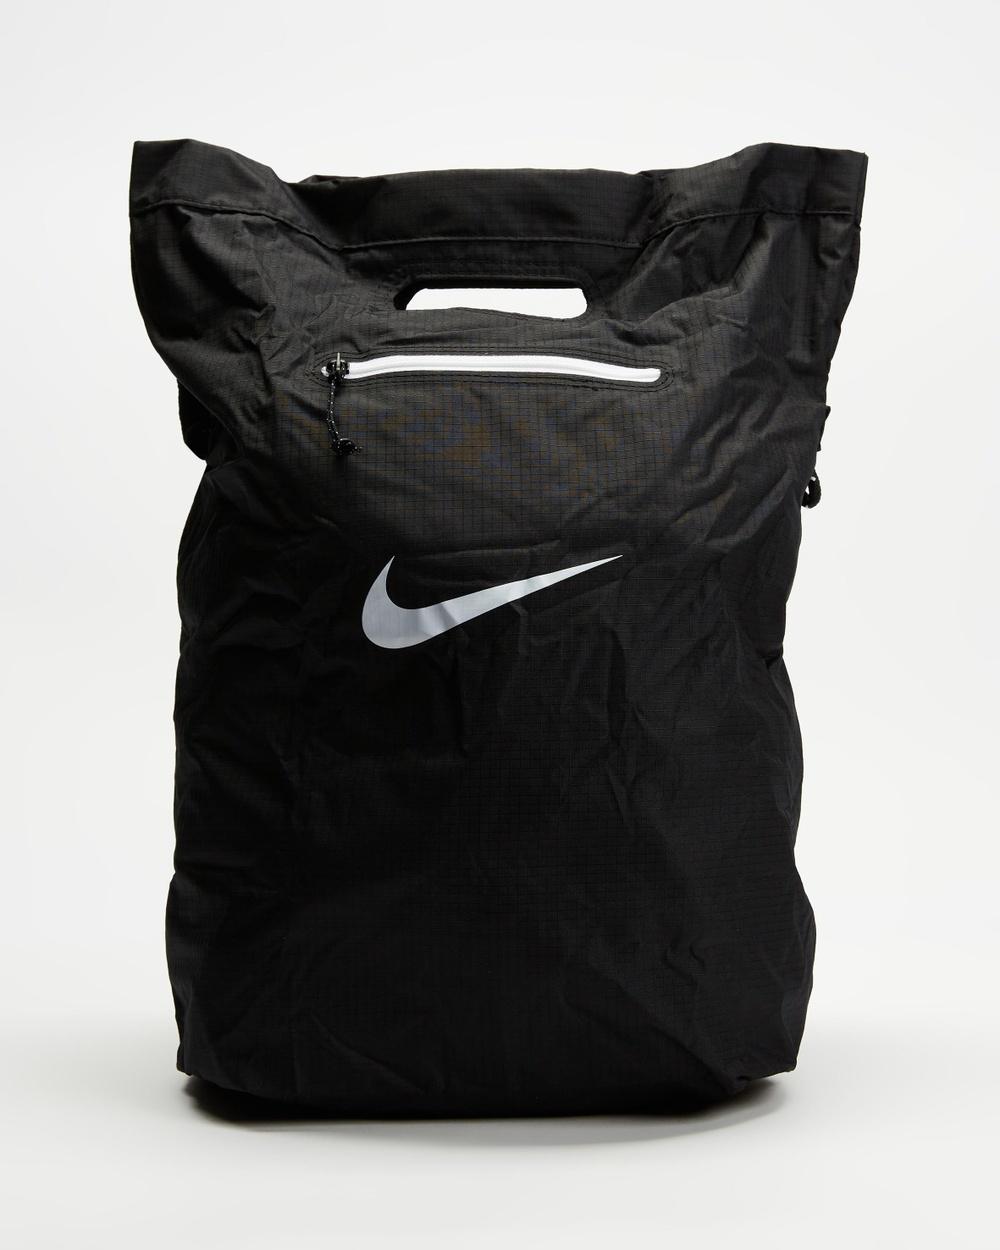 Nike Stash Tote Bags Black & White